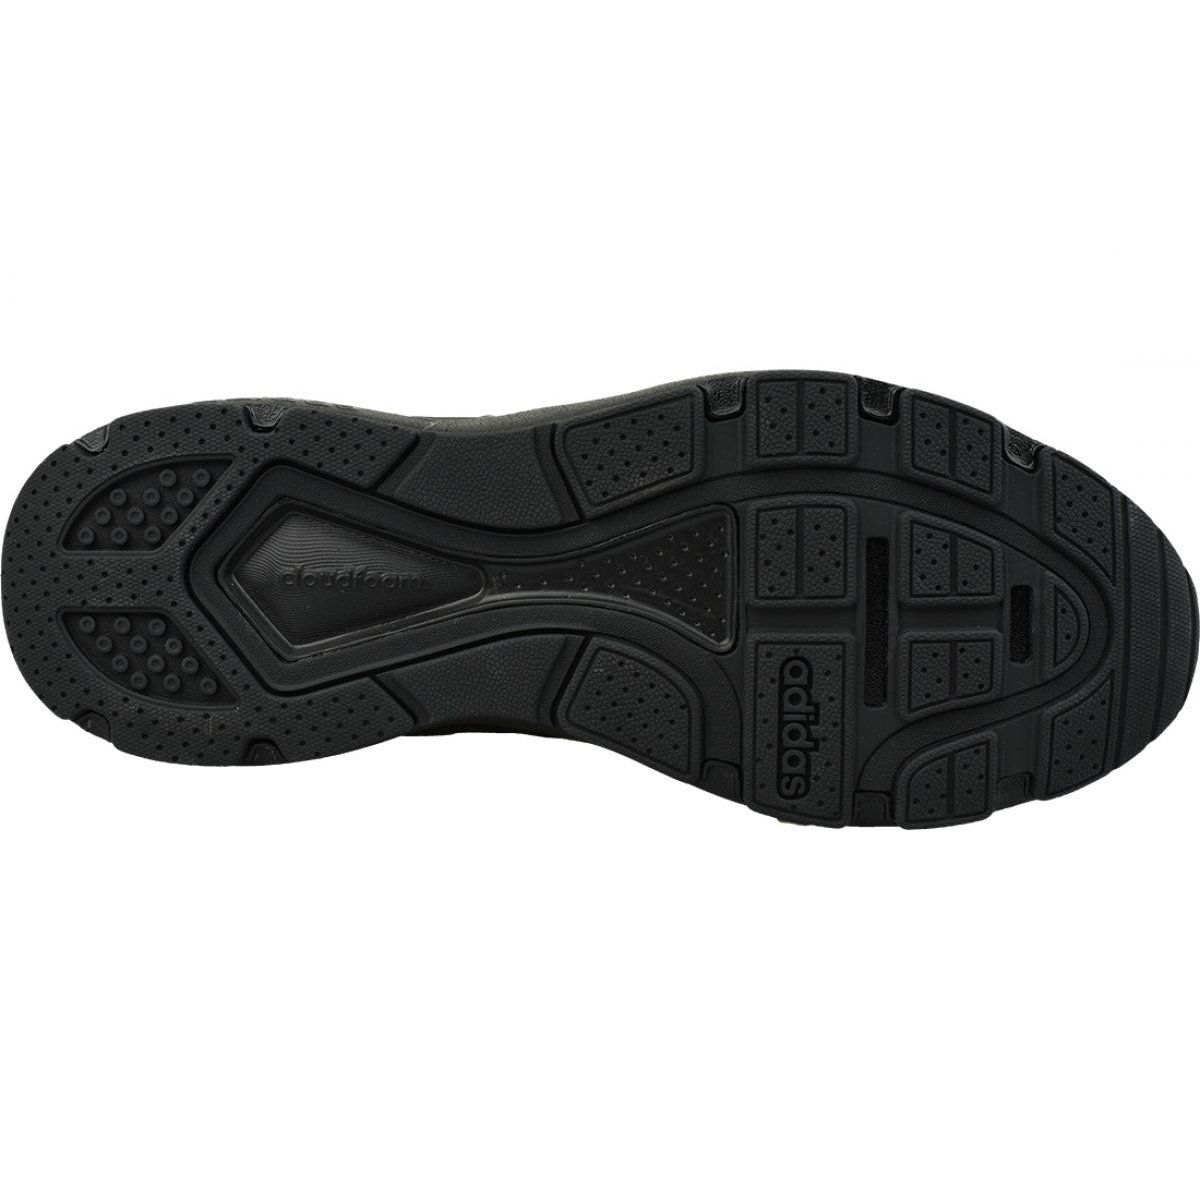 Buty Adidas Crazychaos M Ee5587 Czarne Sports Shoes Adidas Adidas Brand Black Shoes